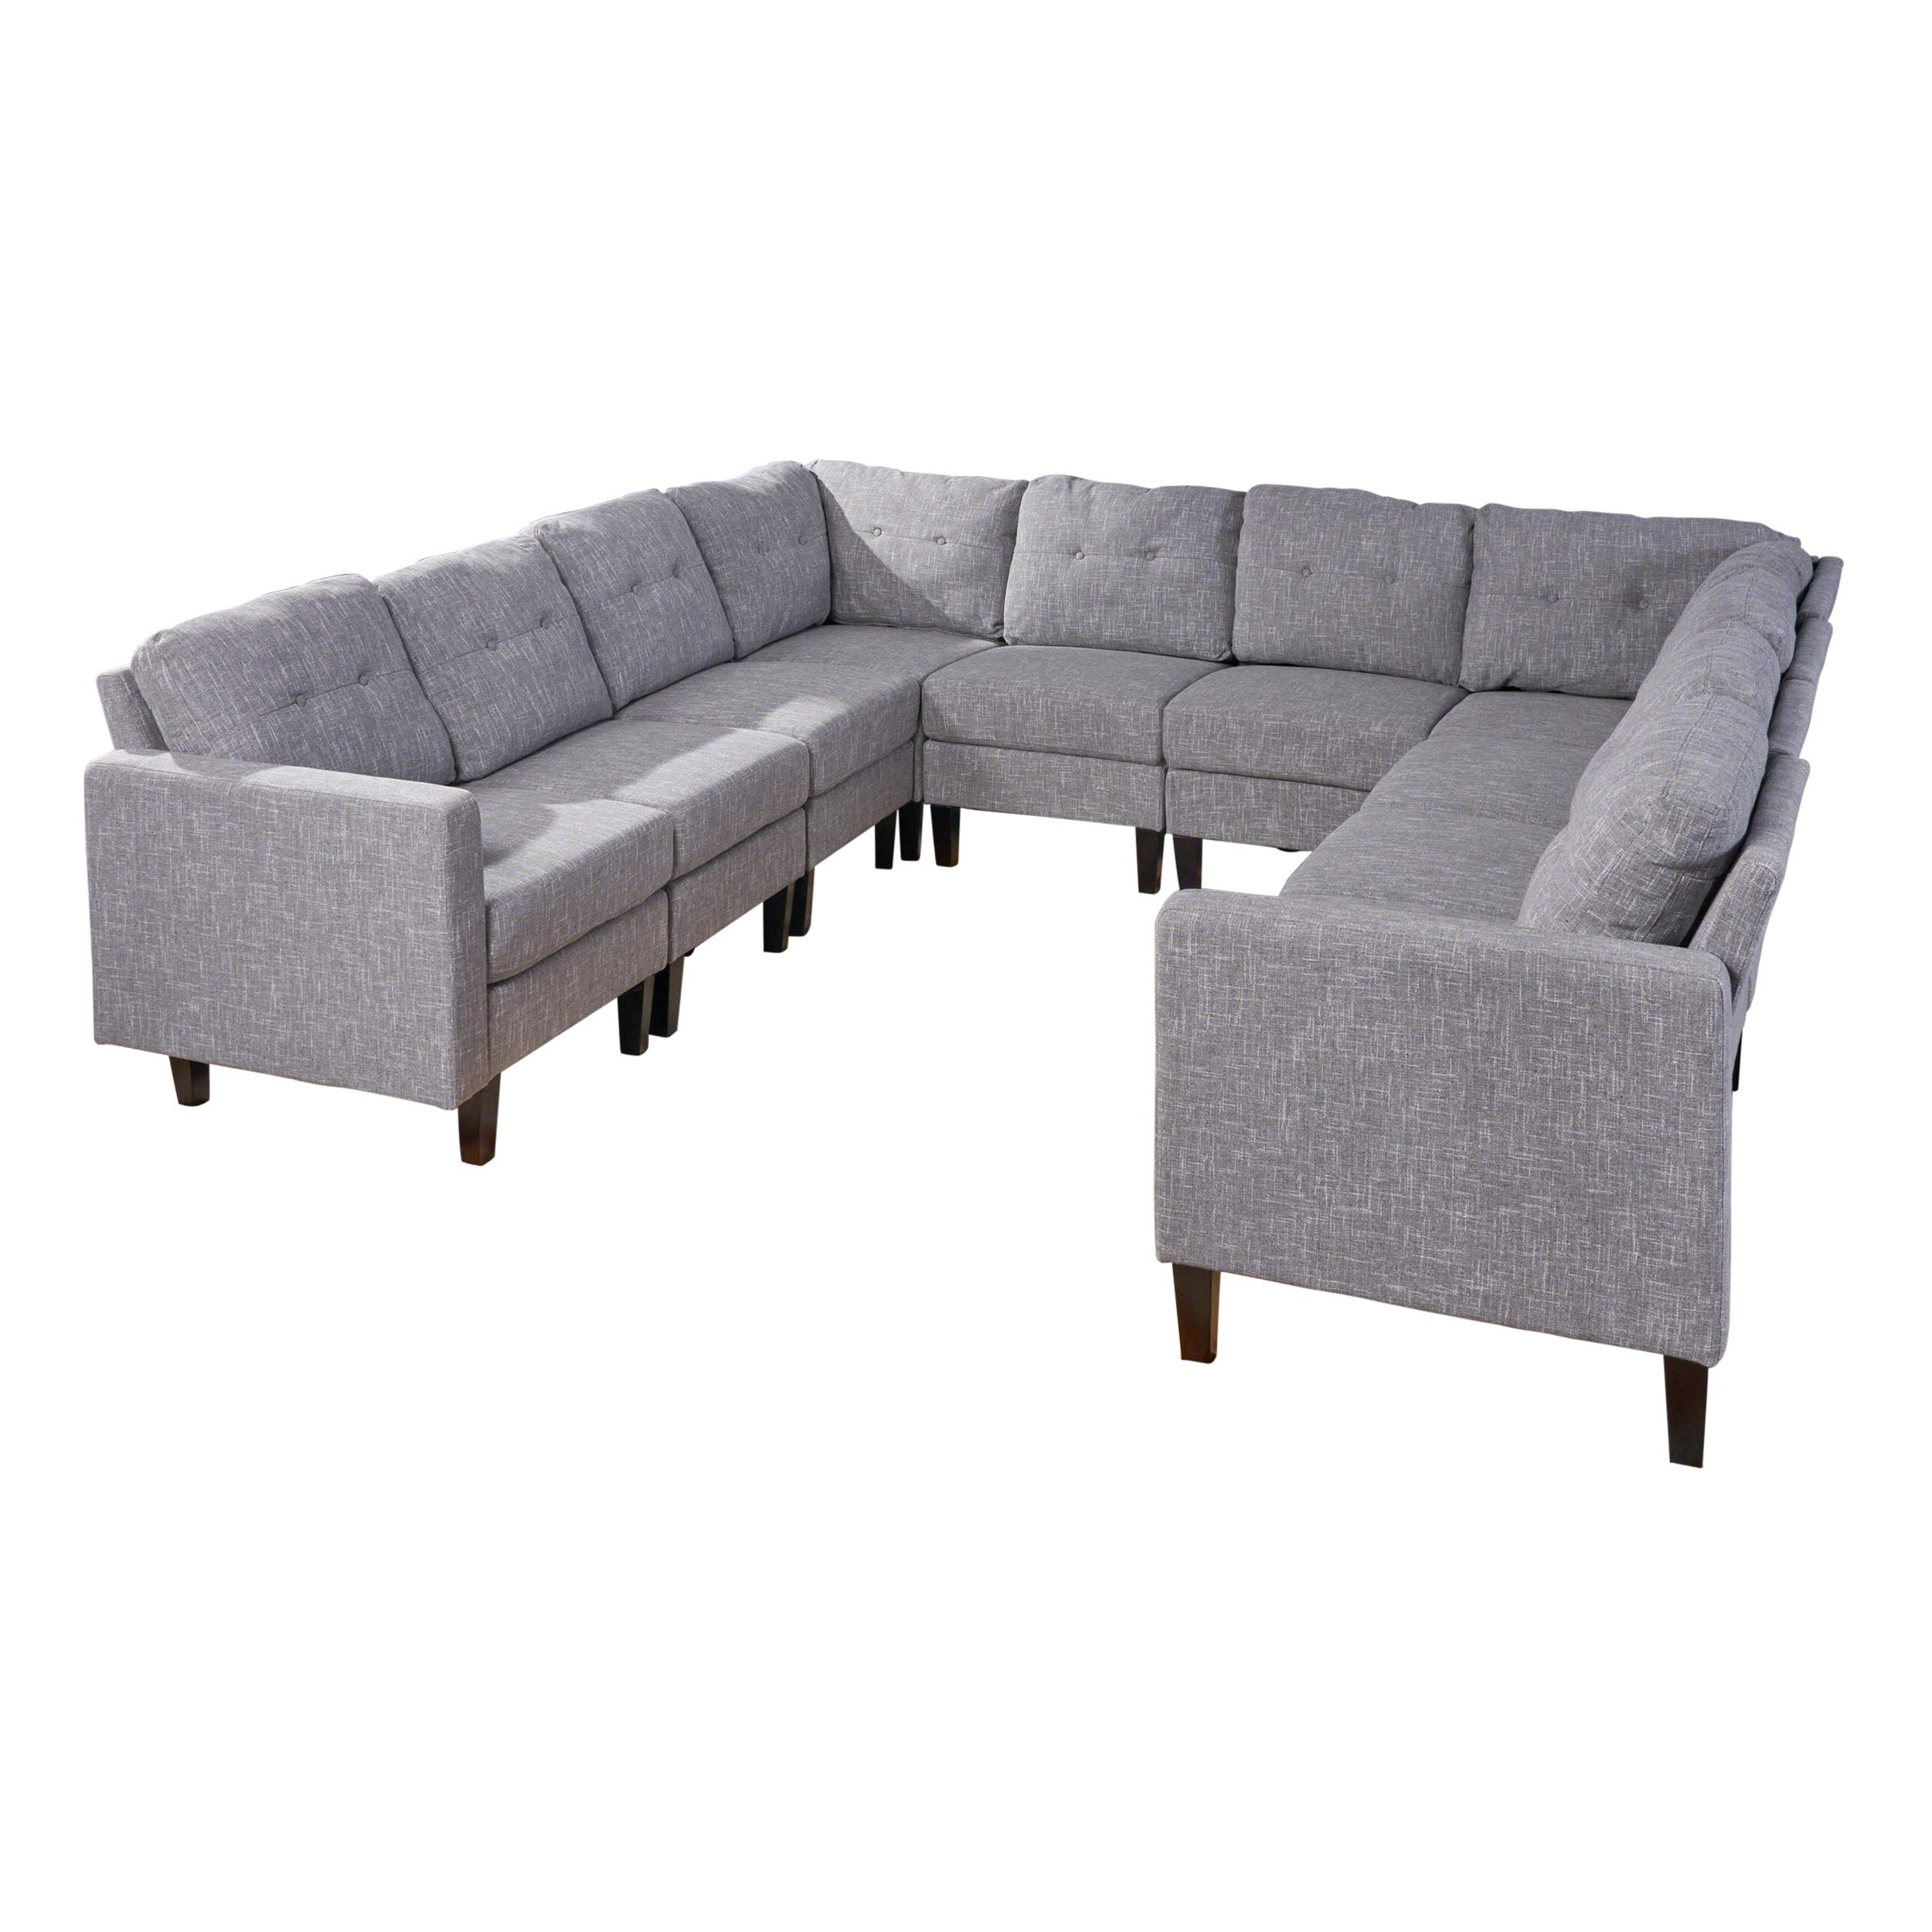 Christopher Knight Home Marsh Mid Century Modern U-Shaped Sectional Sofa Set, Gray Tweed, Dark Walnut by Christopher Knight Home